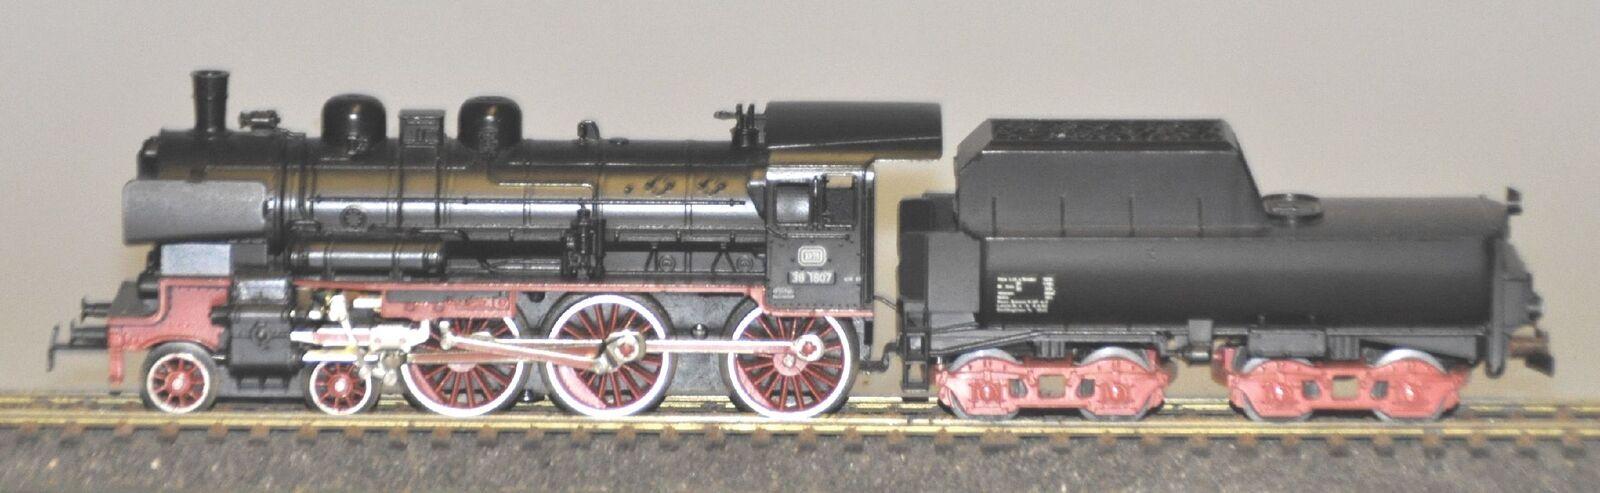 Märklin HAMO , br38 (p8) (p8) (p8) locomotiva M. vasche tender, h0-corrente continua de63ff